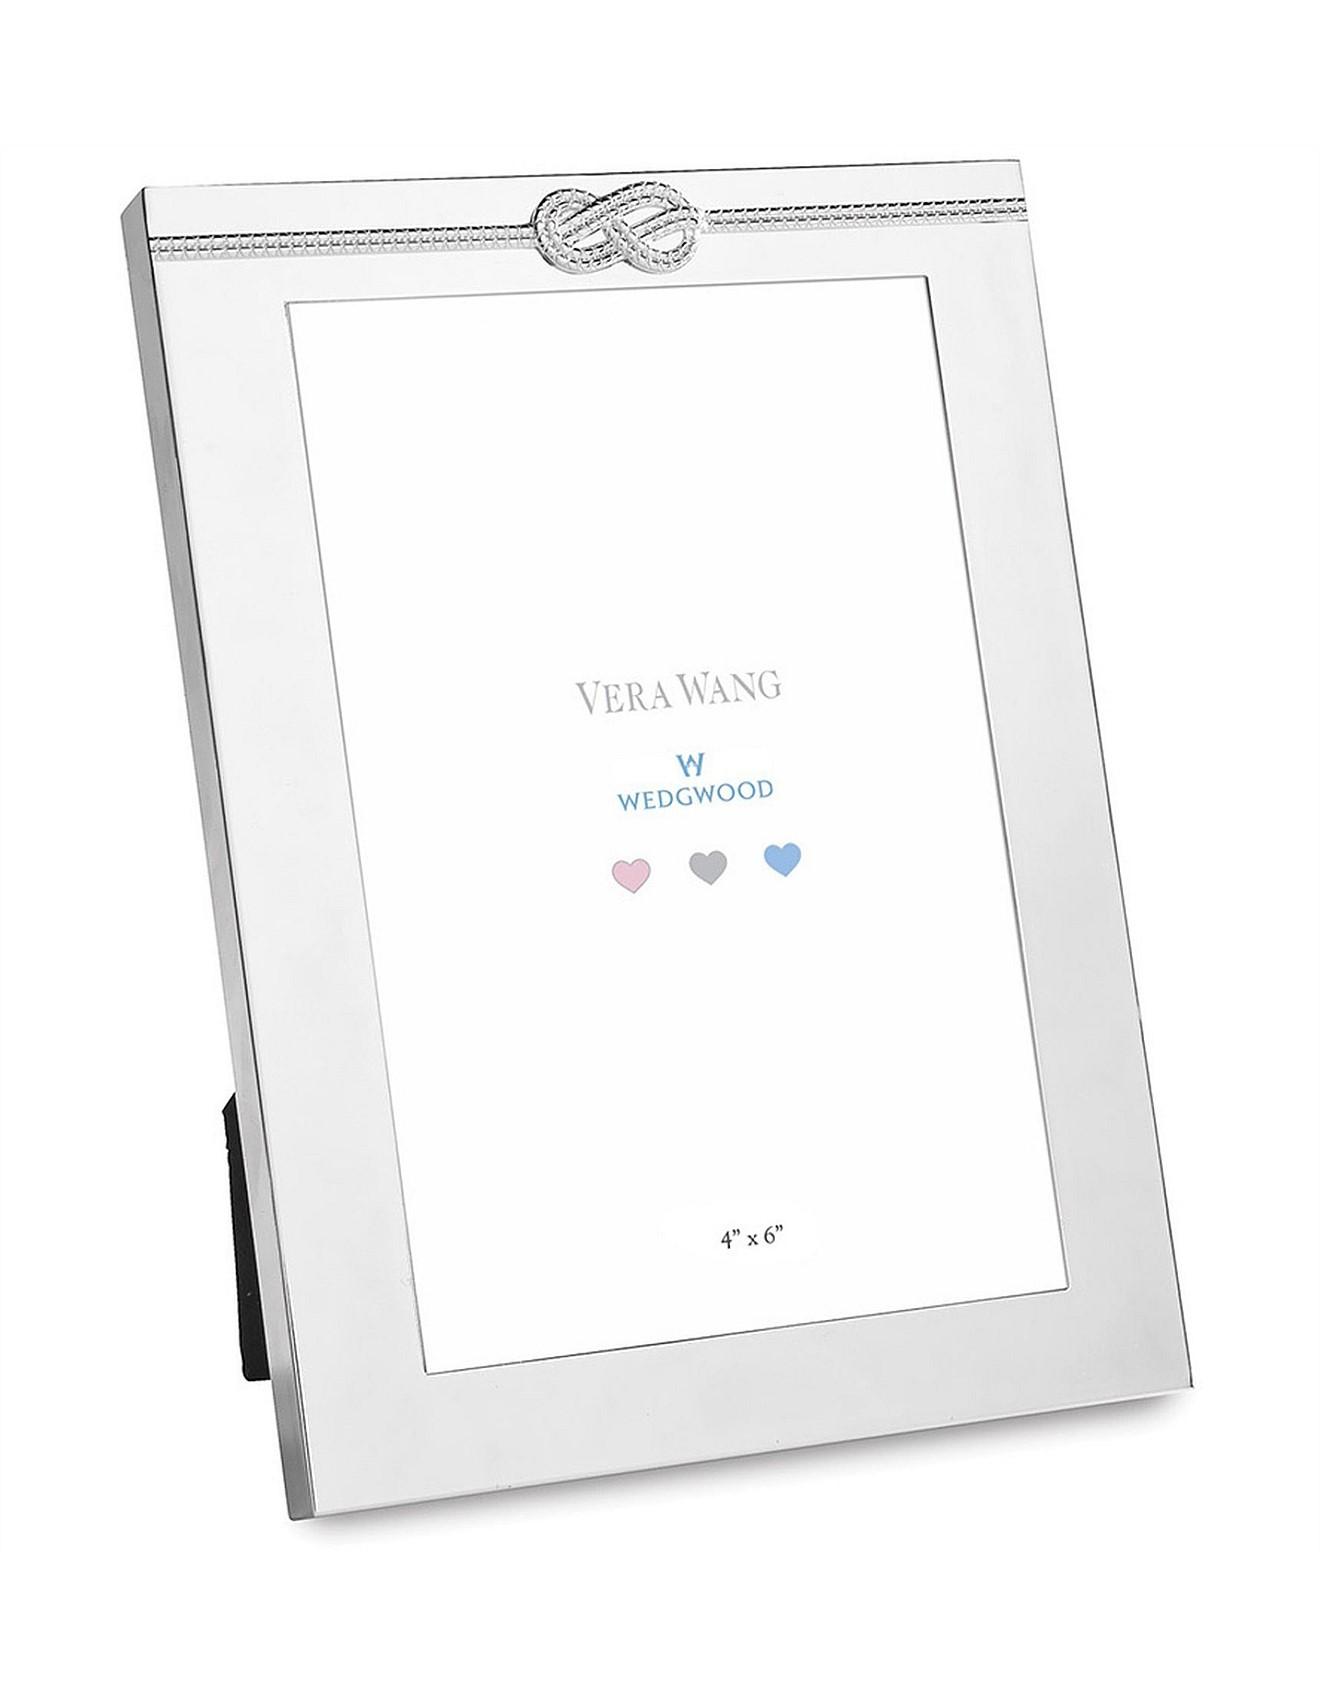 Photo Frames | Buy Picture Frames Online | David Jones - Vera Wang ...